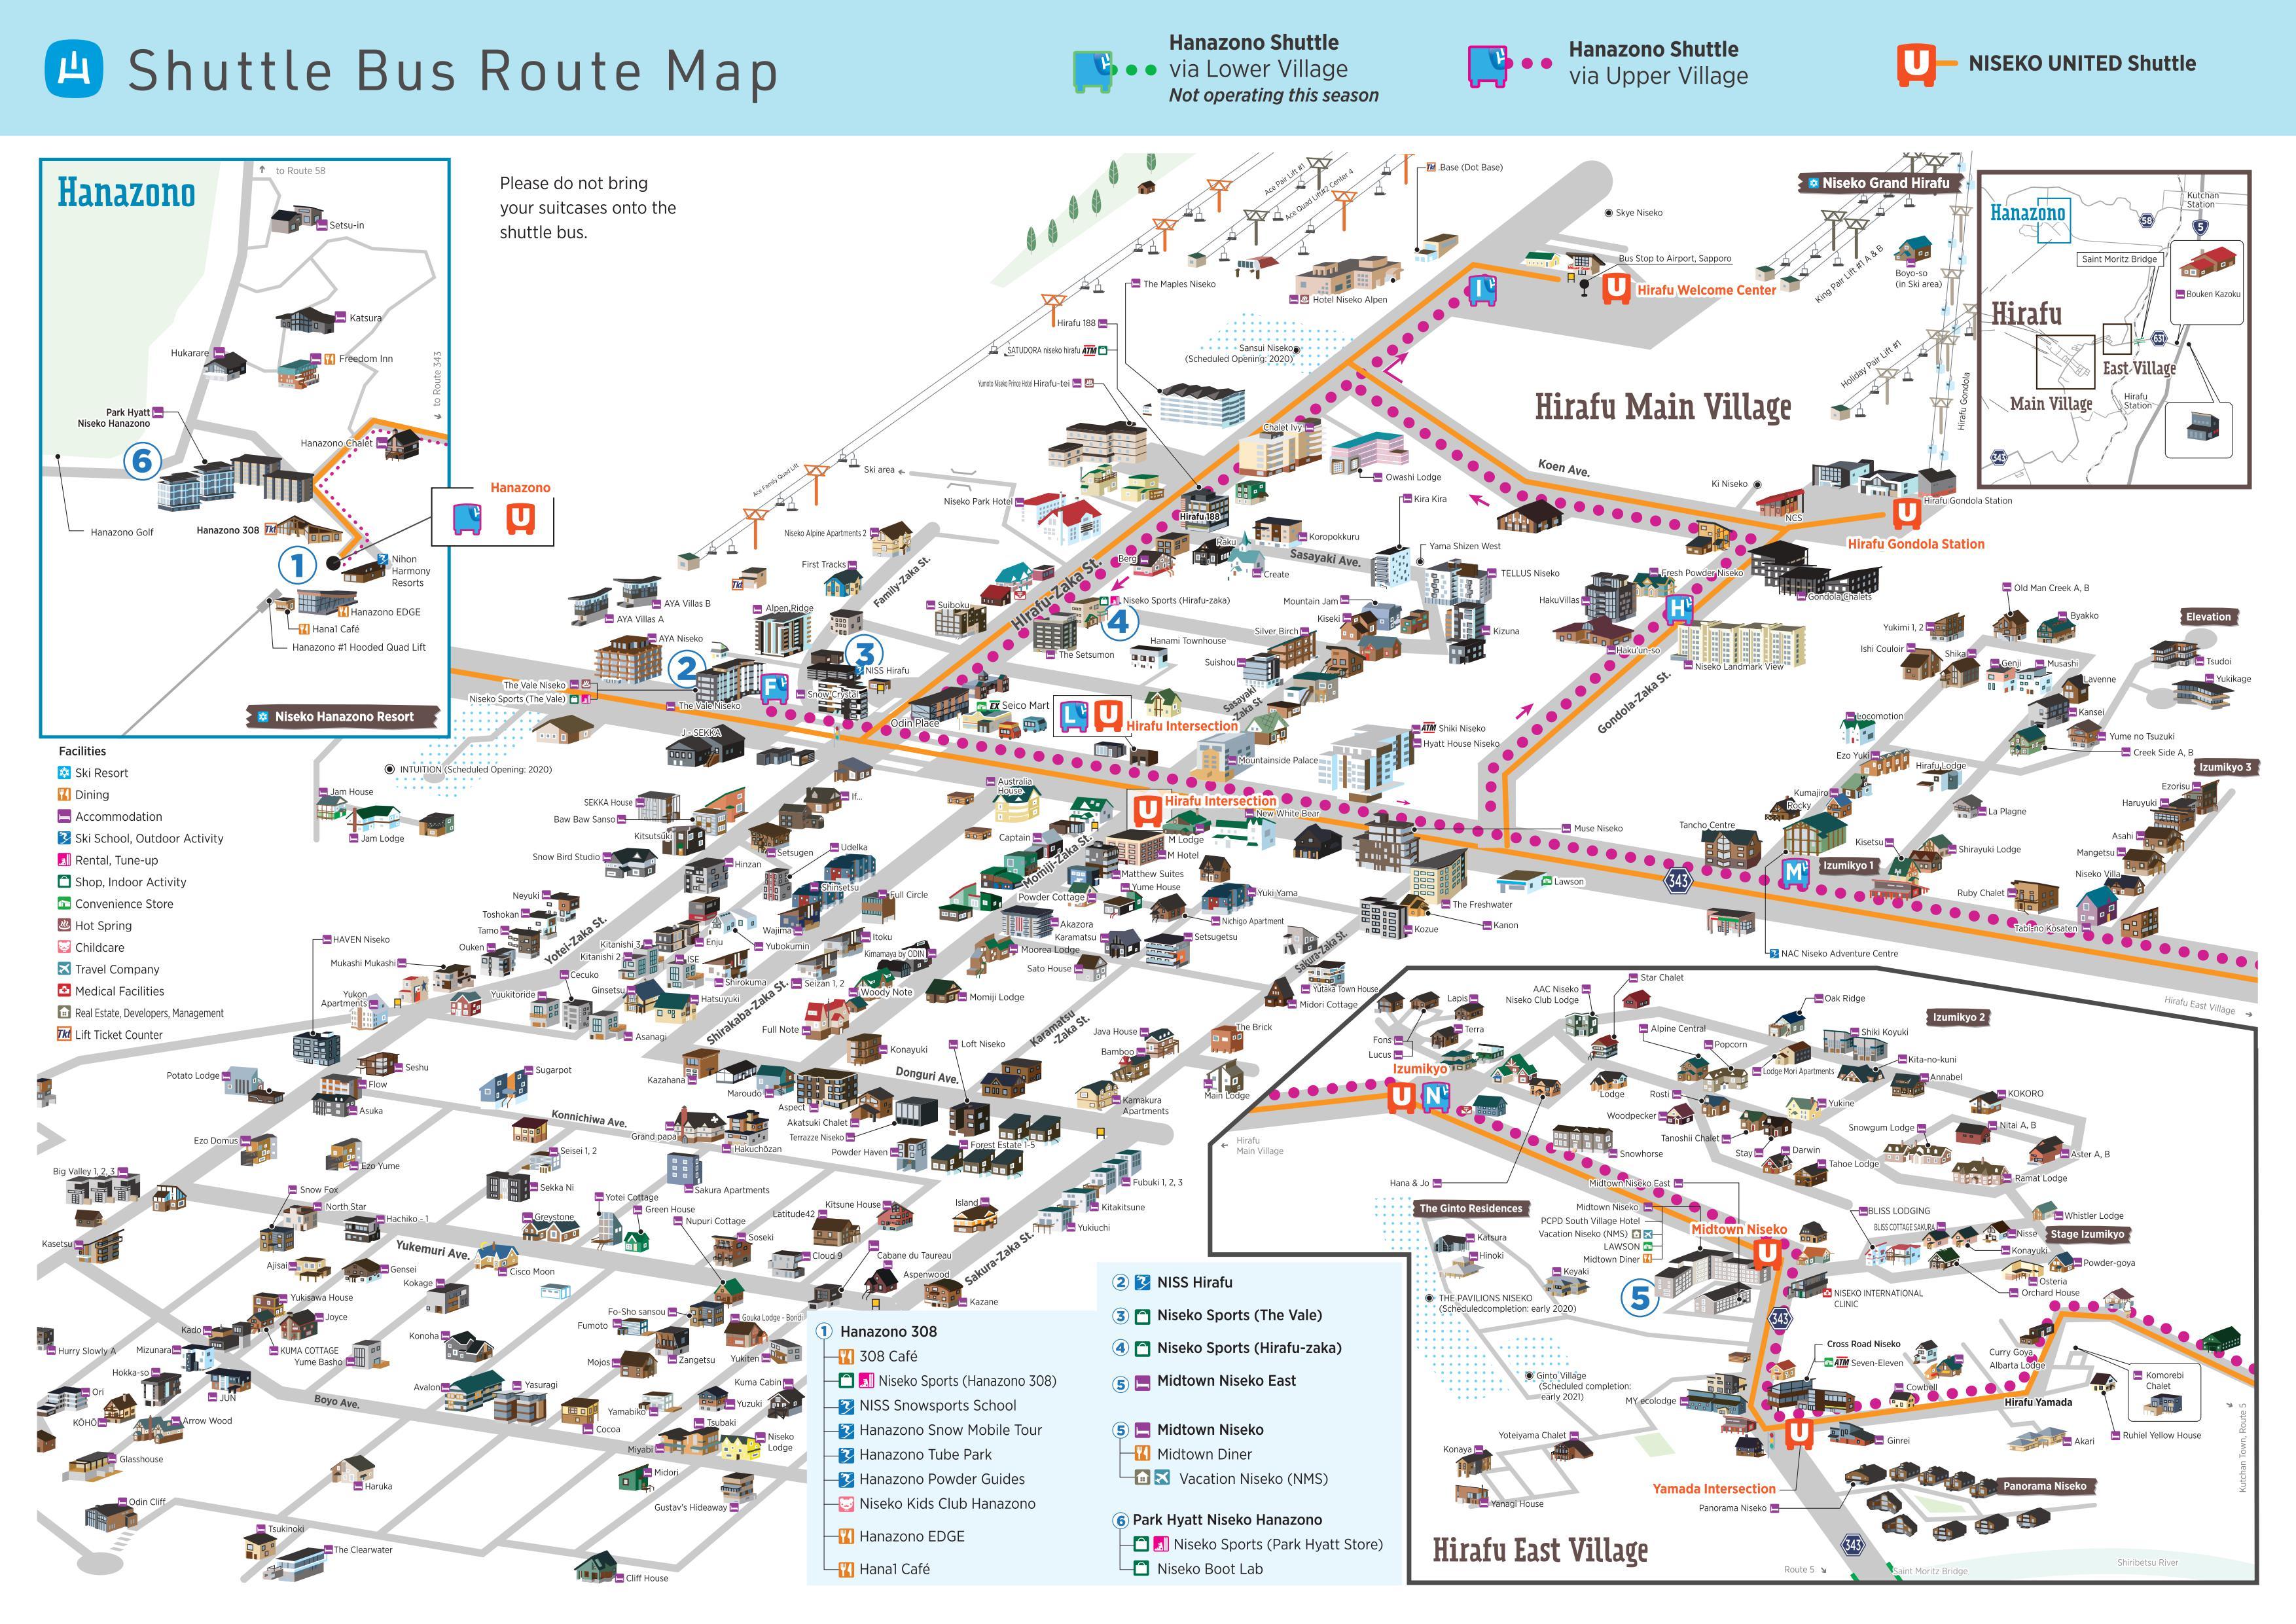 Hanazono free shuttle bus